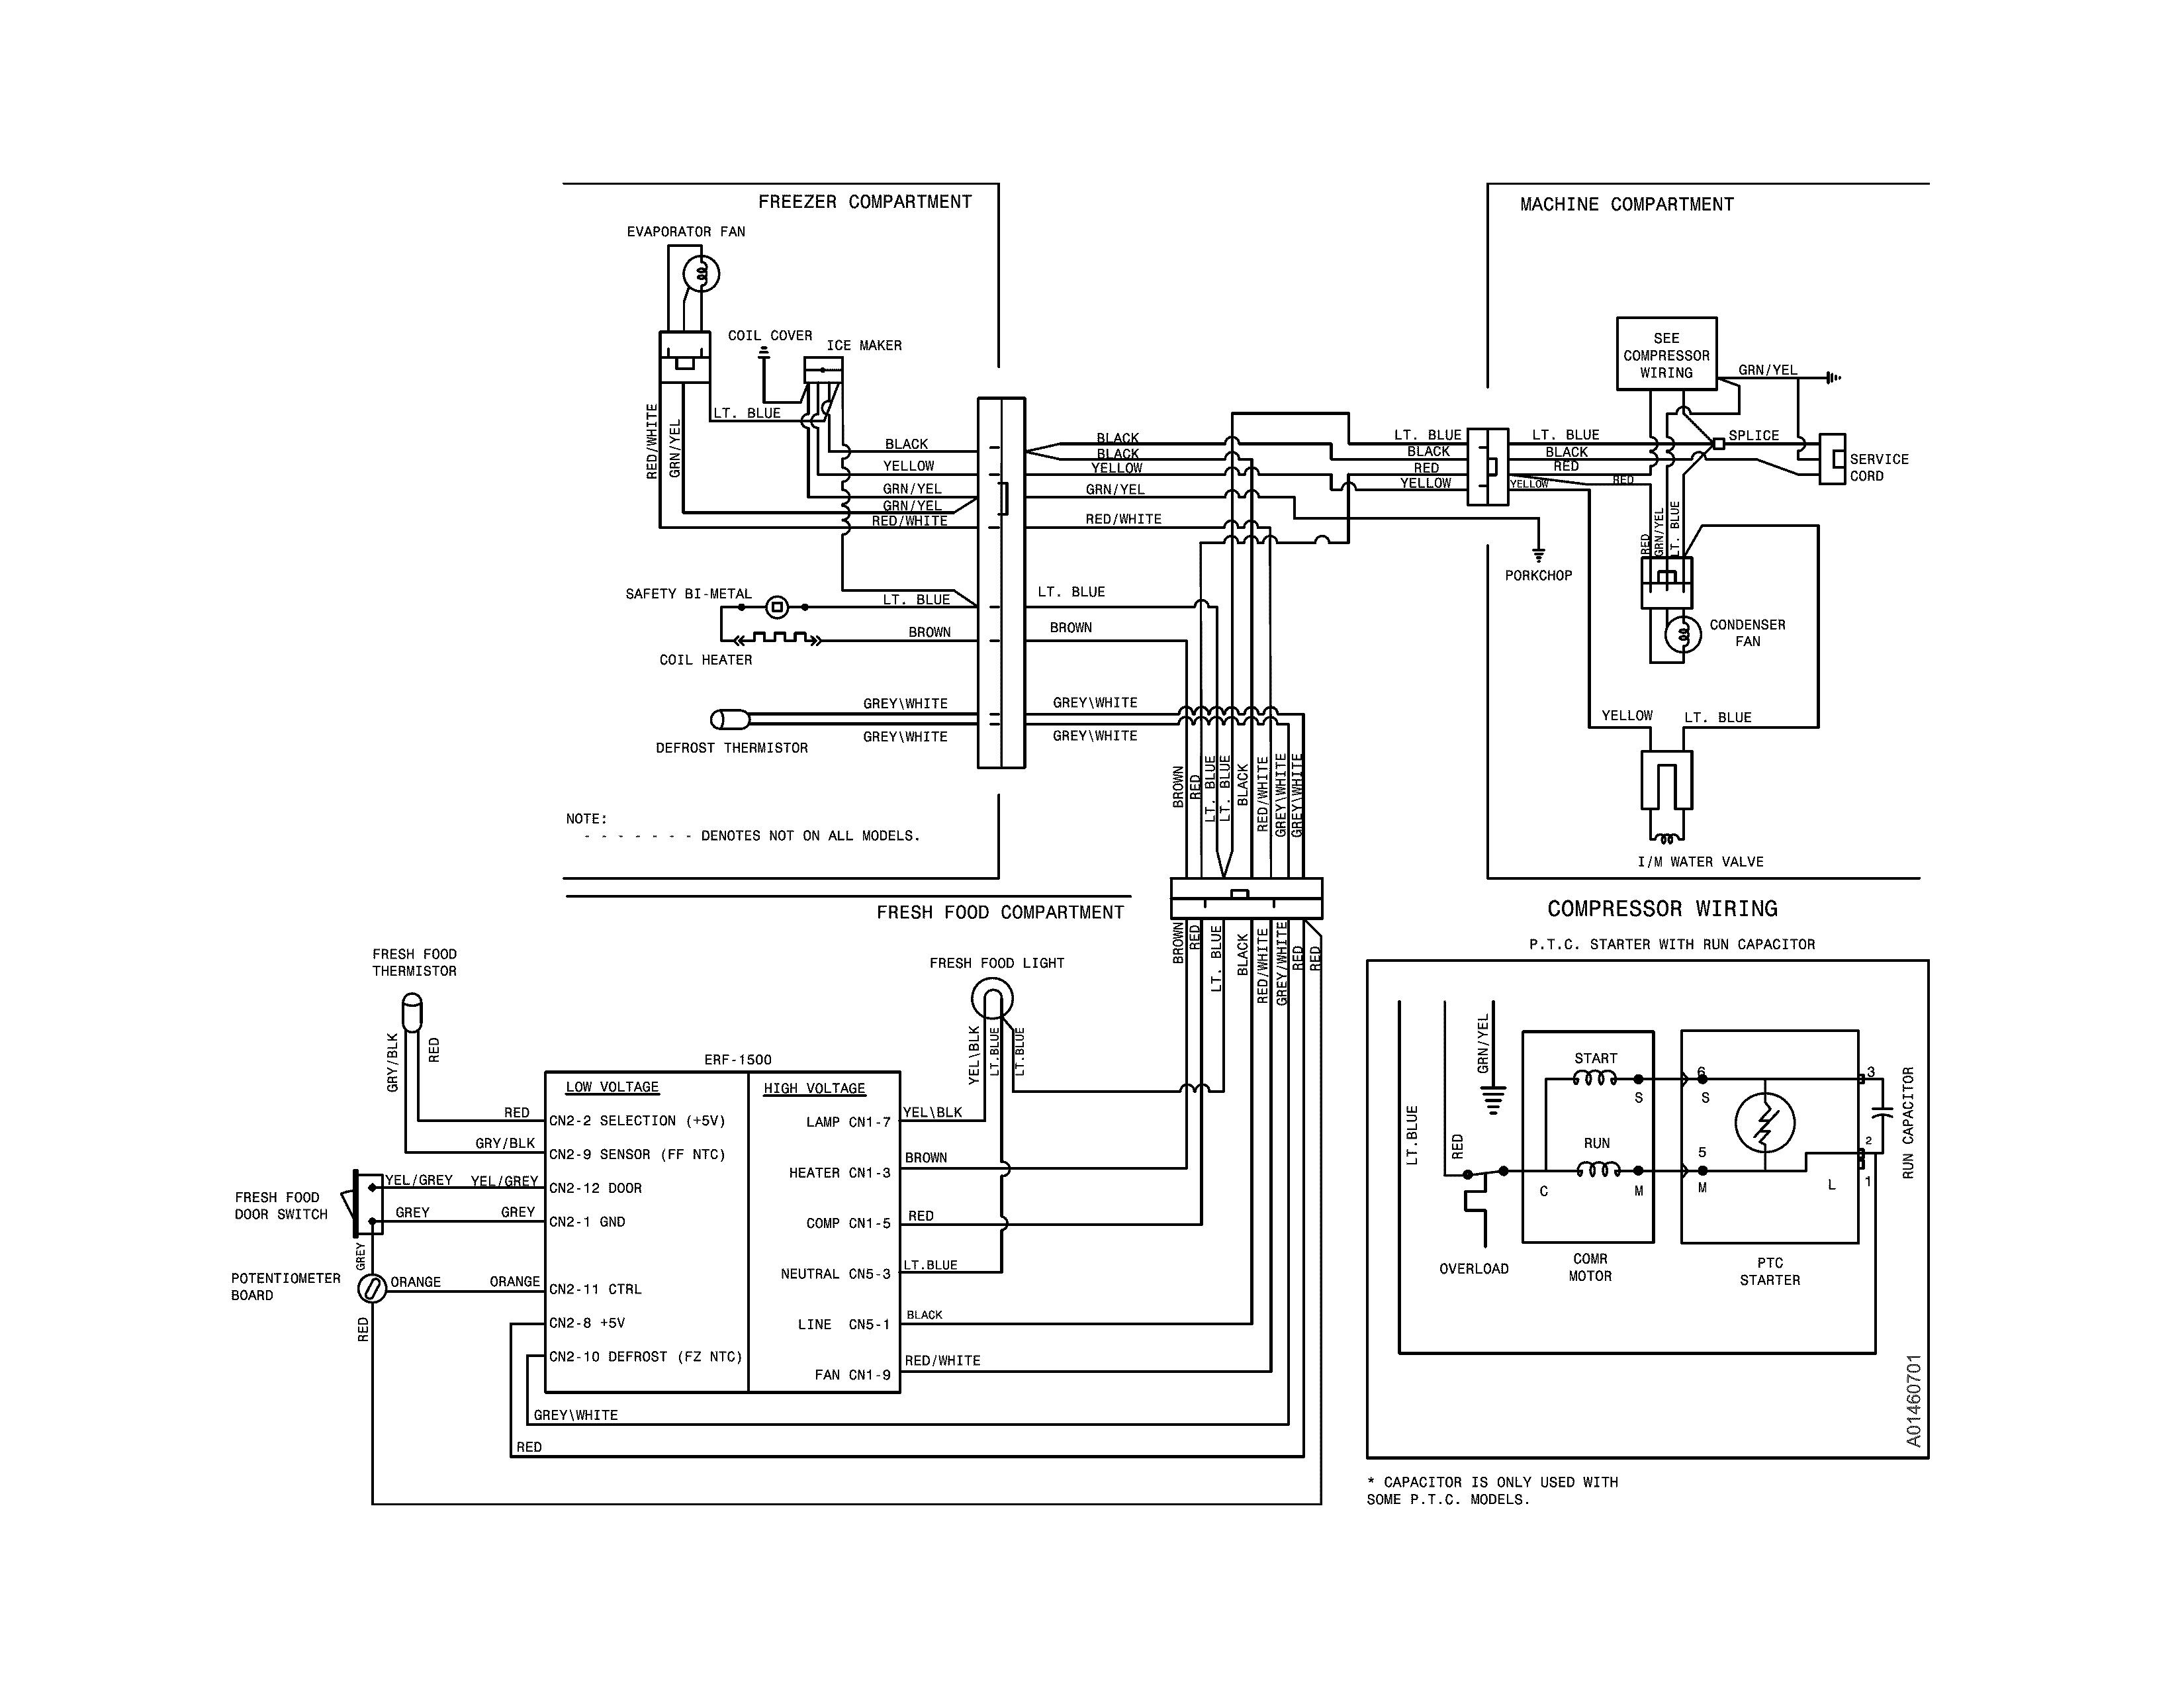 Frigidaire Wire Diagram - Aftermarket Stereo Wire Diagram -  bonek.santai.decorresine.itWiring Diagram Resource